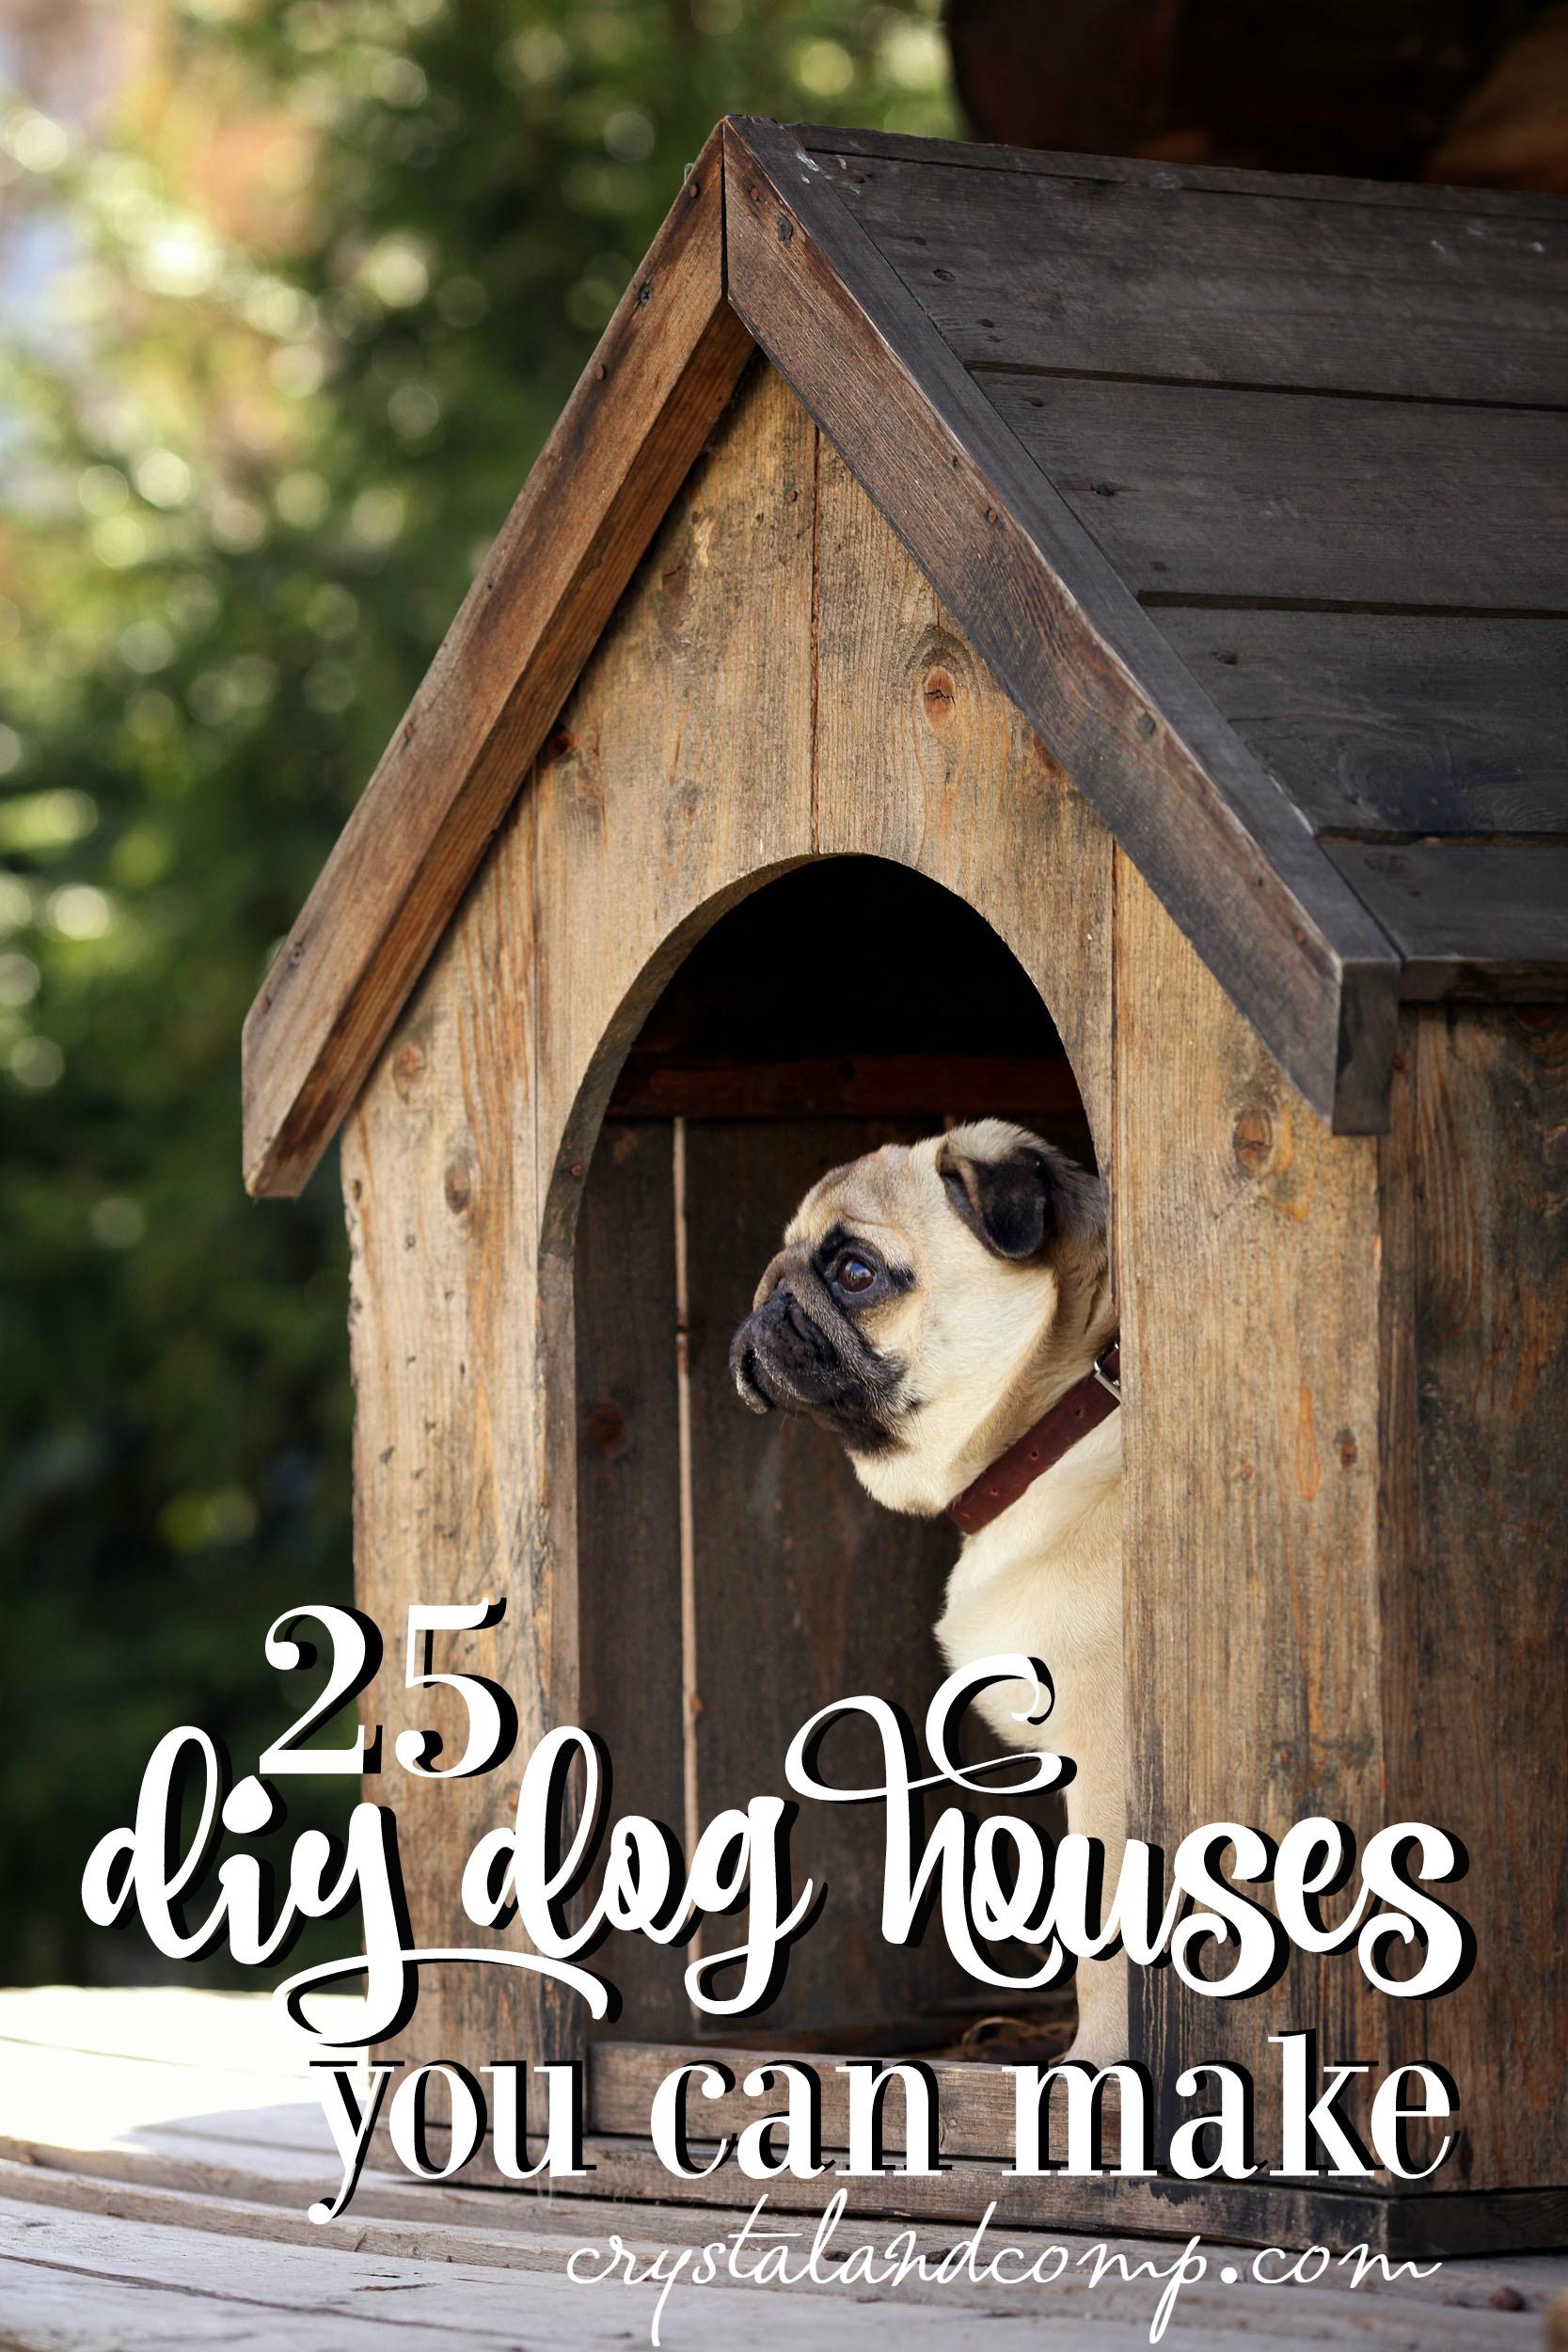 homemade dog kennels 2. 25 DIY Dog Houses You Can Make Homemade Kennels 2